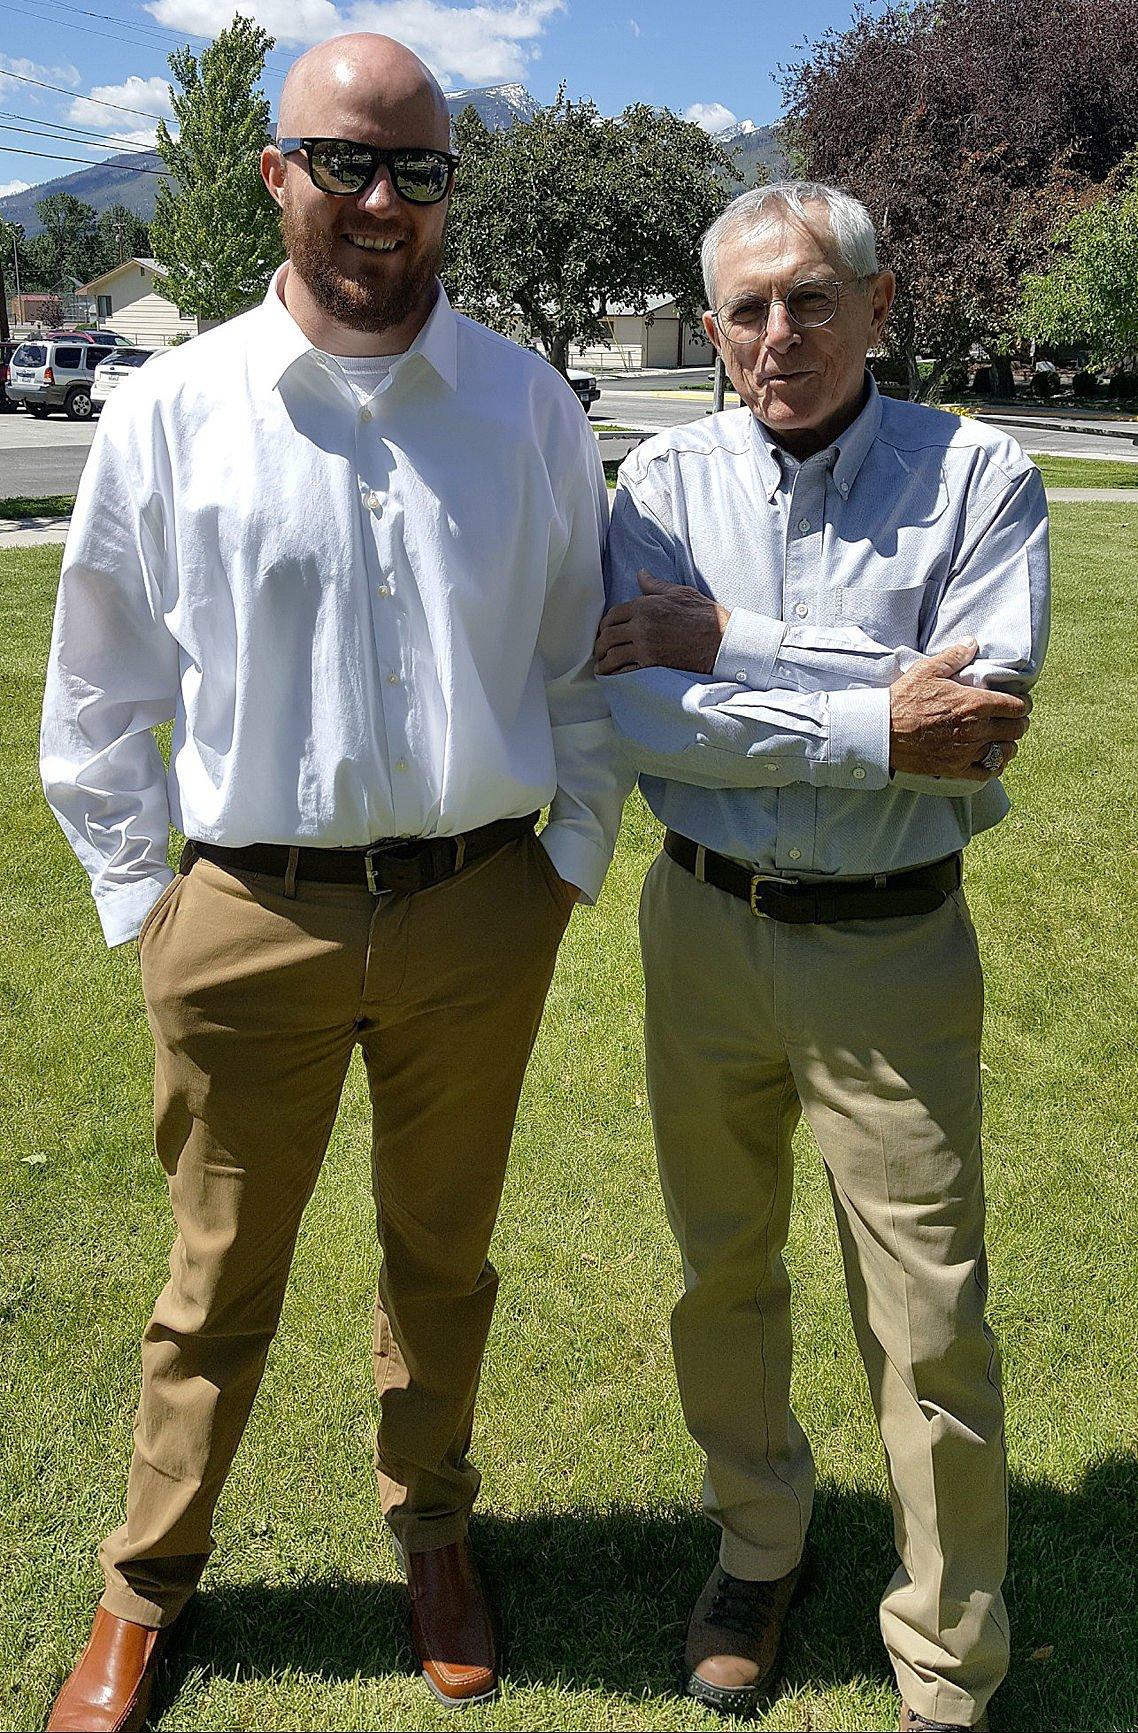 Judge Archibald and Reardon